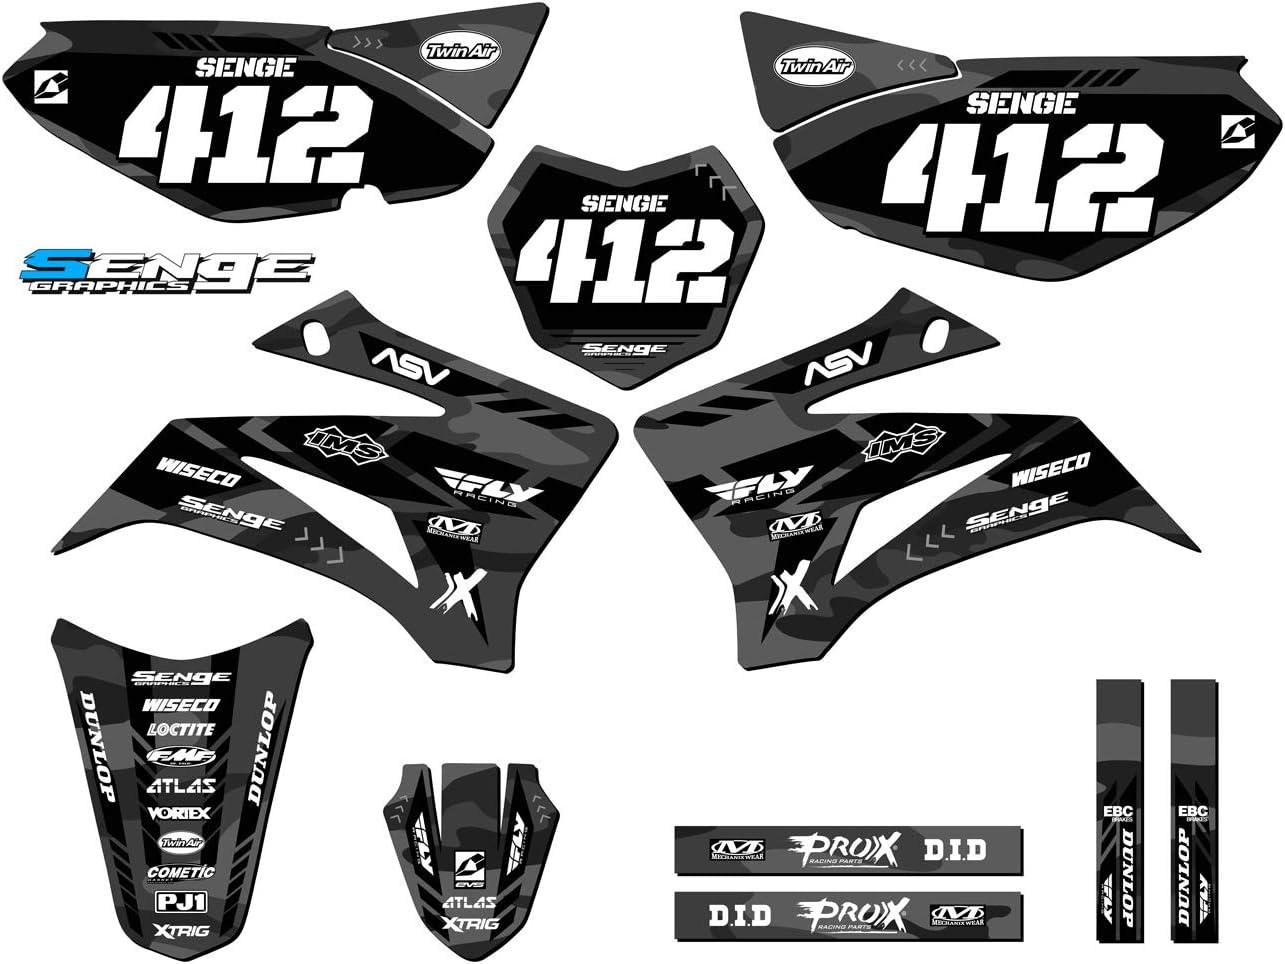 Apache Green Base kit 2008-2020 TTR 125 Senge Graphics Compatible with Yamaha